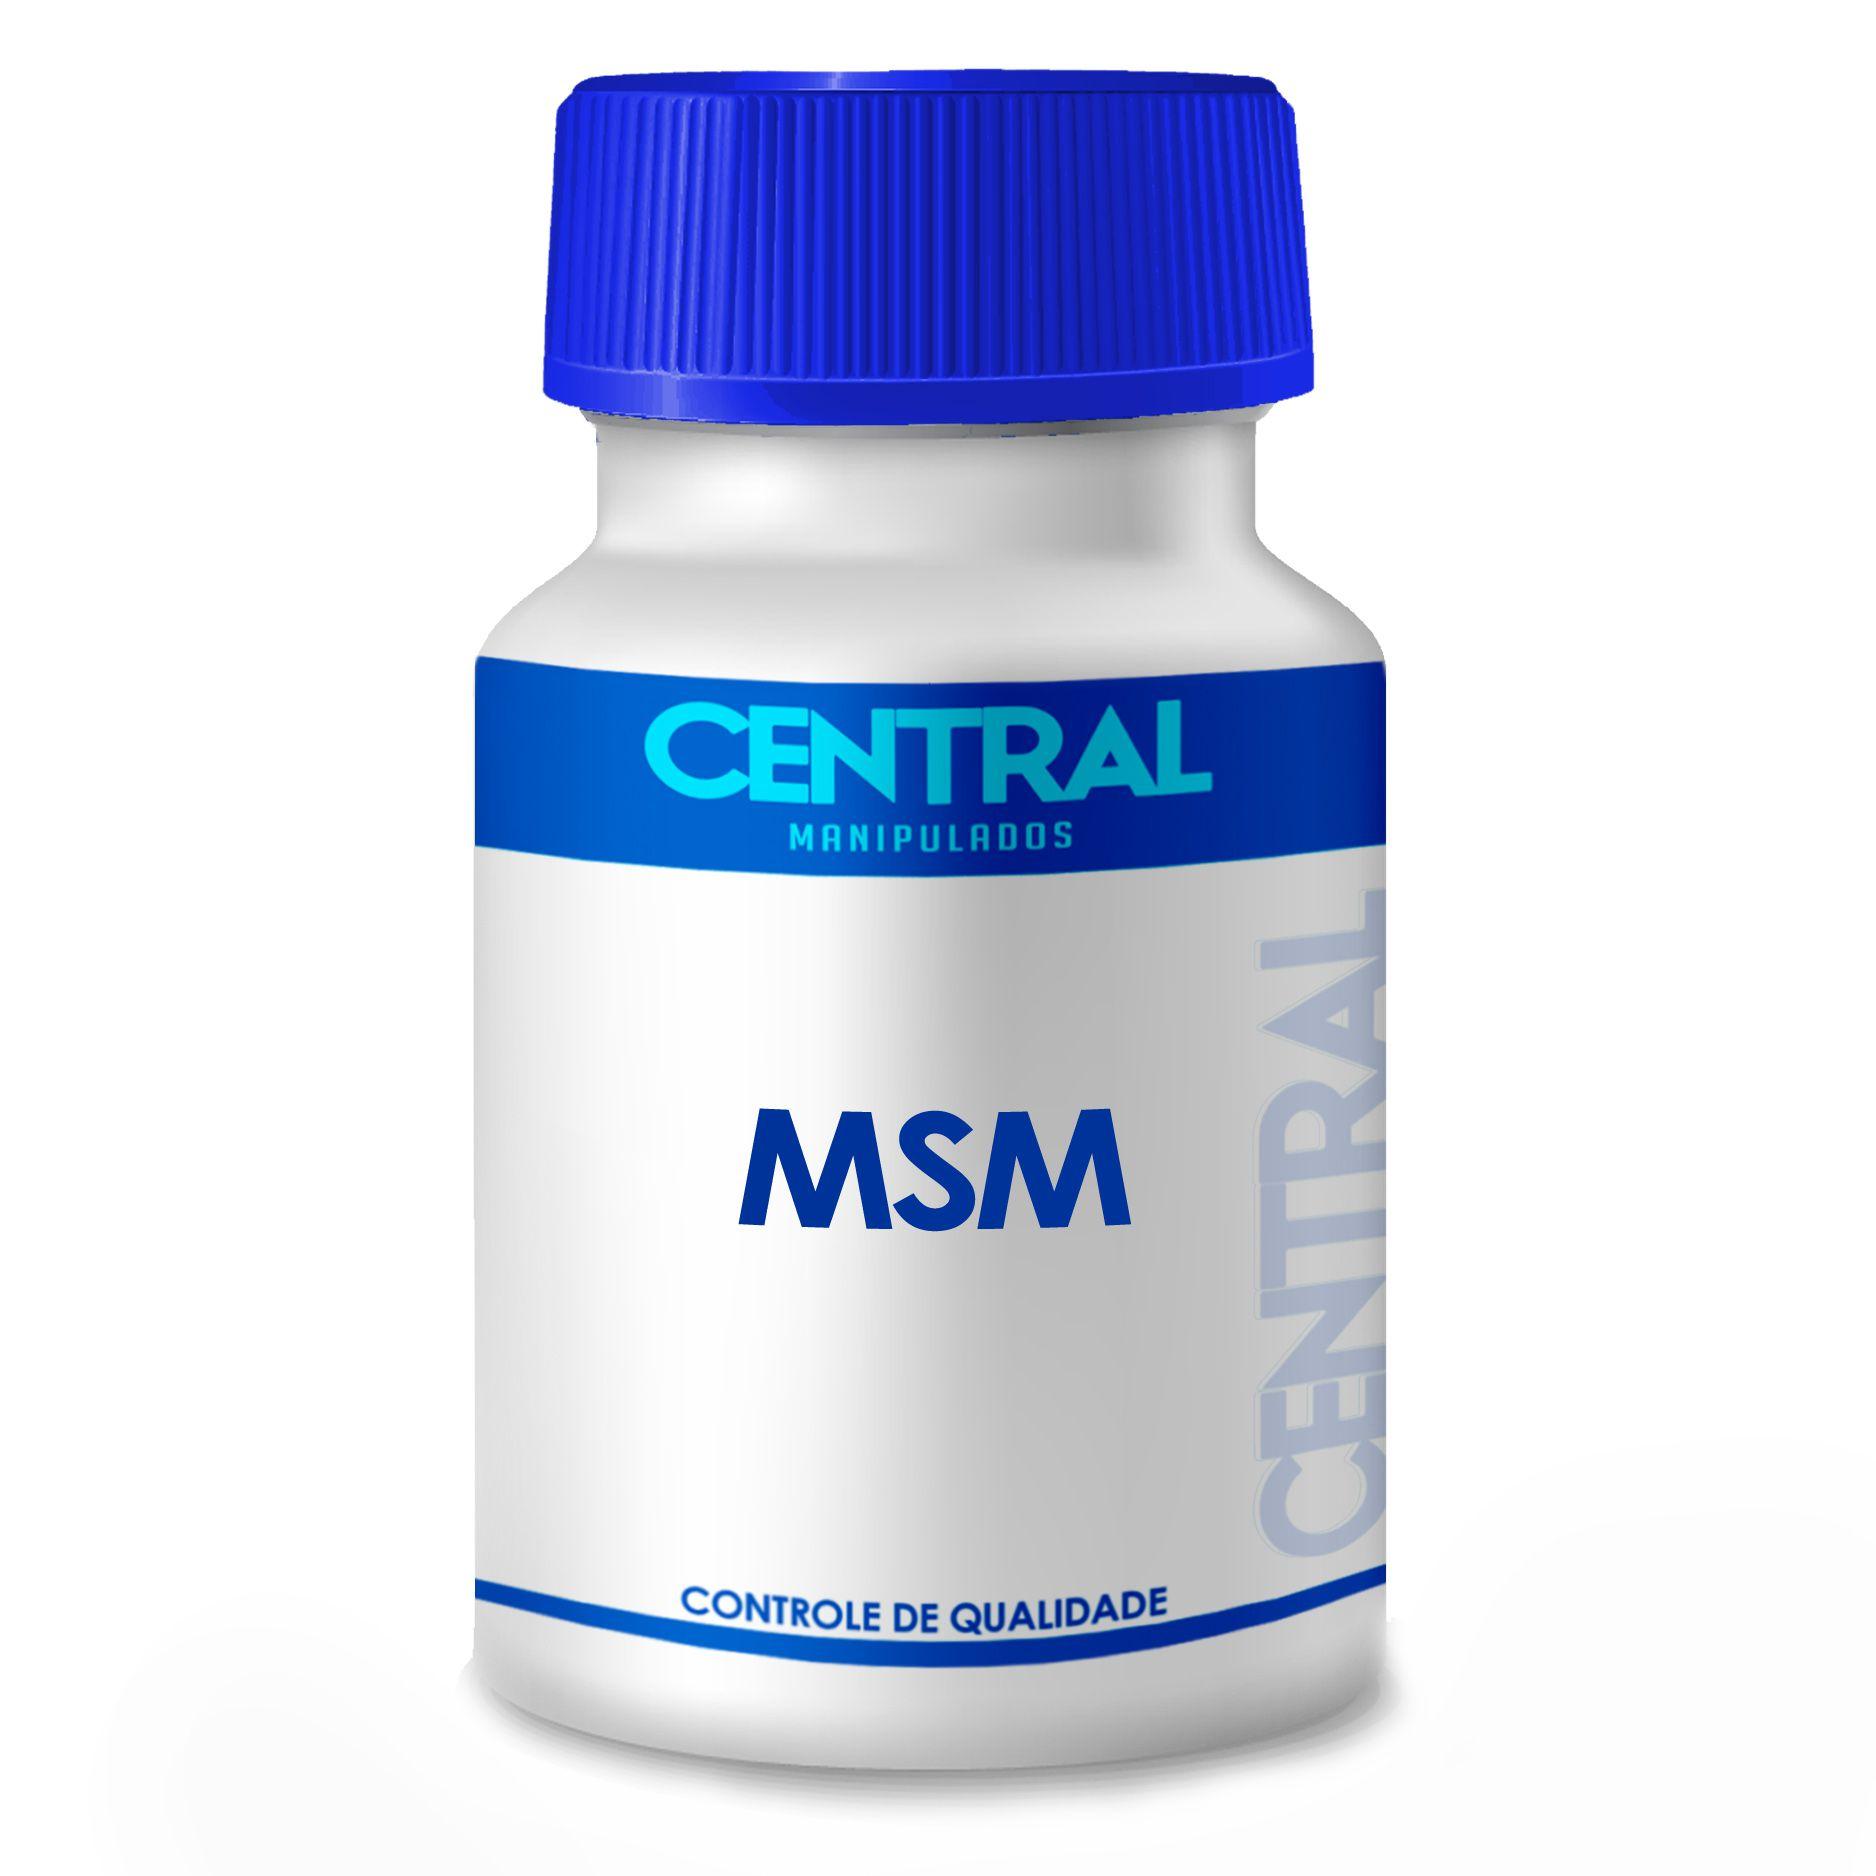 MSM 500mg 30 cápsulas - forma natural de enxofre orgânico